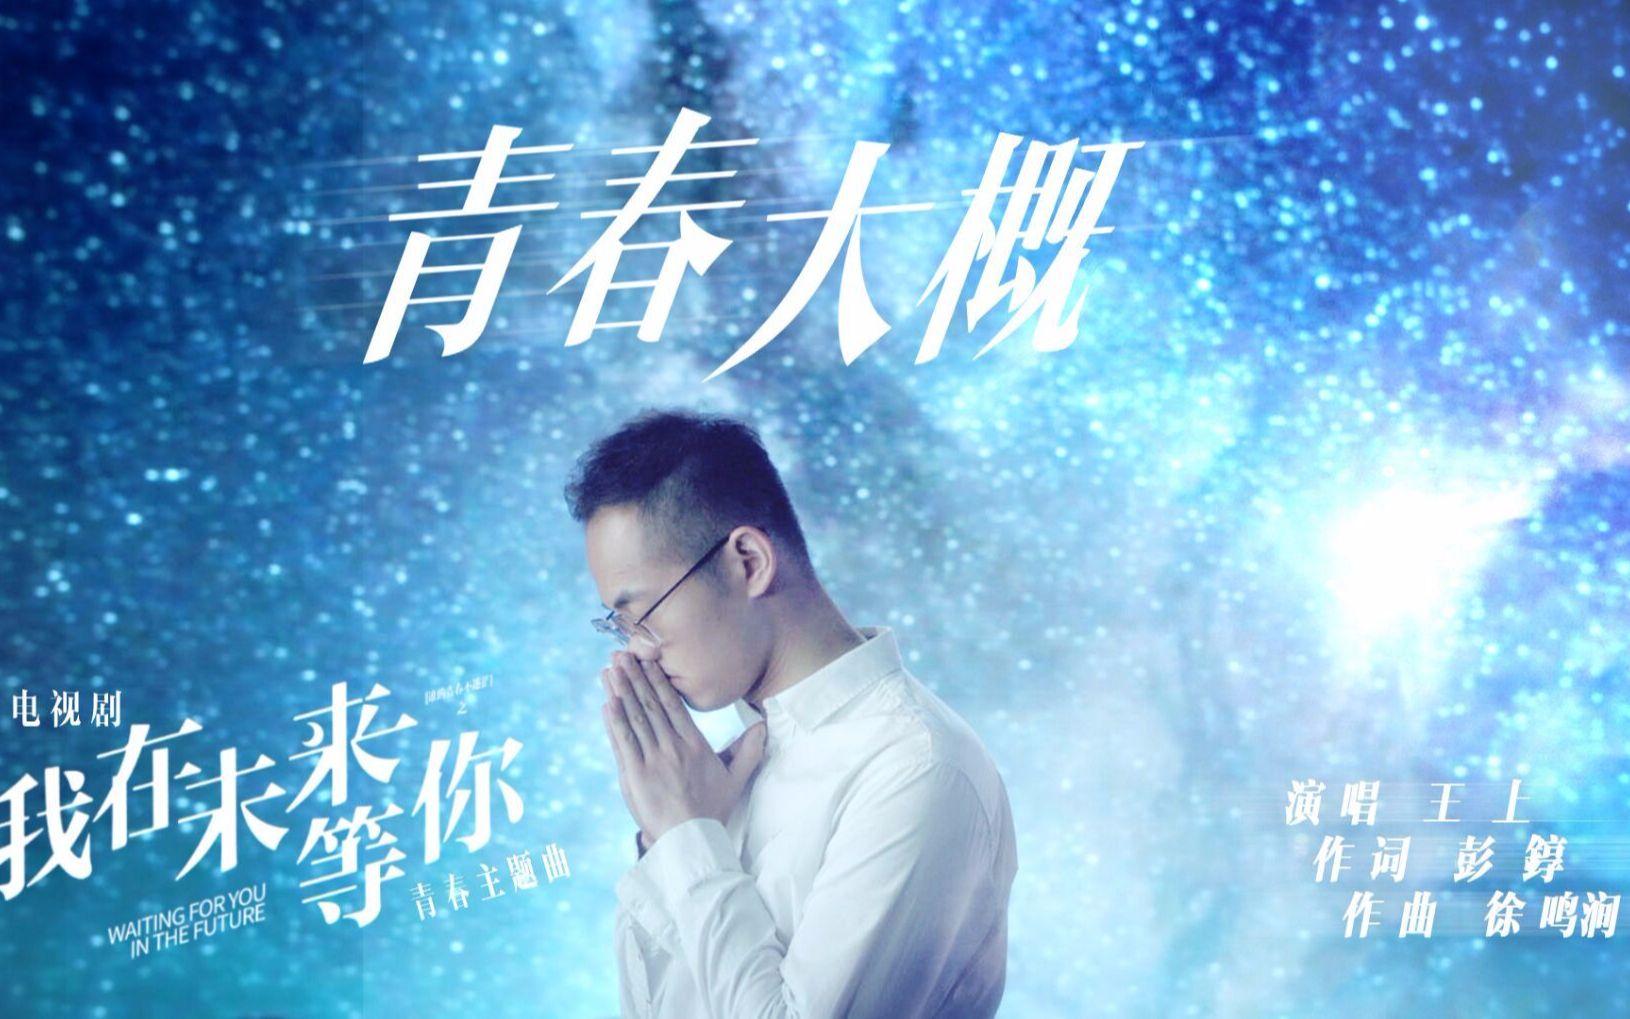 【未來歌單】電視劇《我在未來等你》MV《青春大概》_嗶哩嗶哩 (゜-゜)つロ 干杯~-bilibili